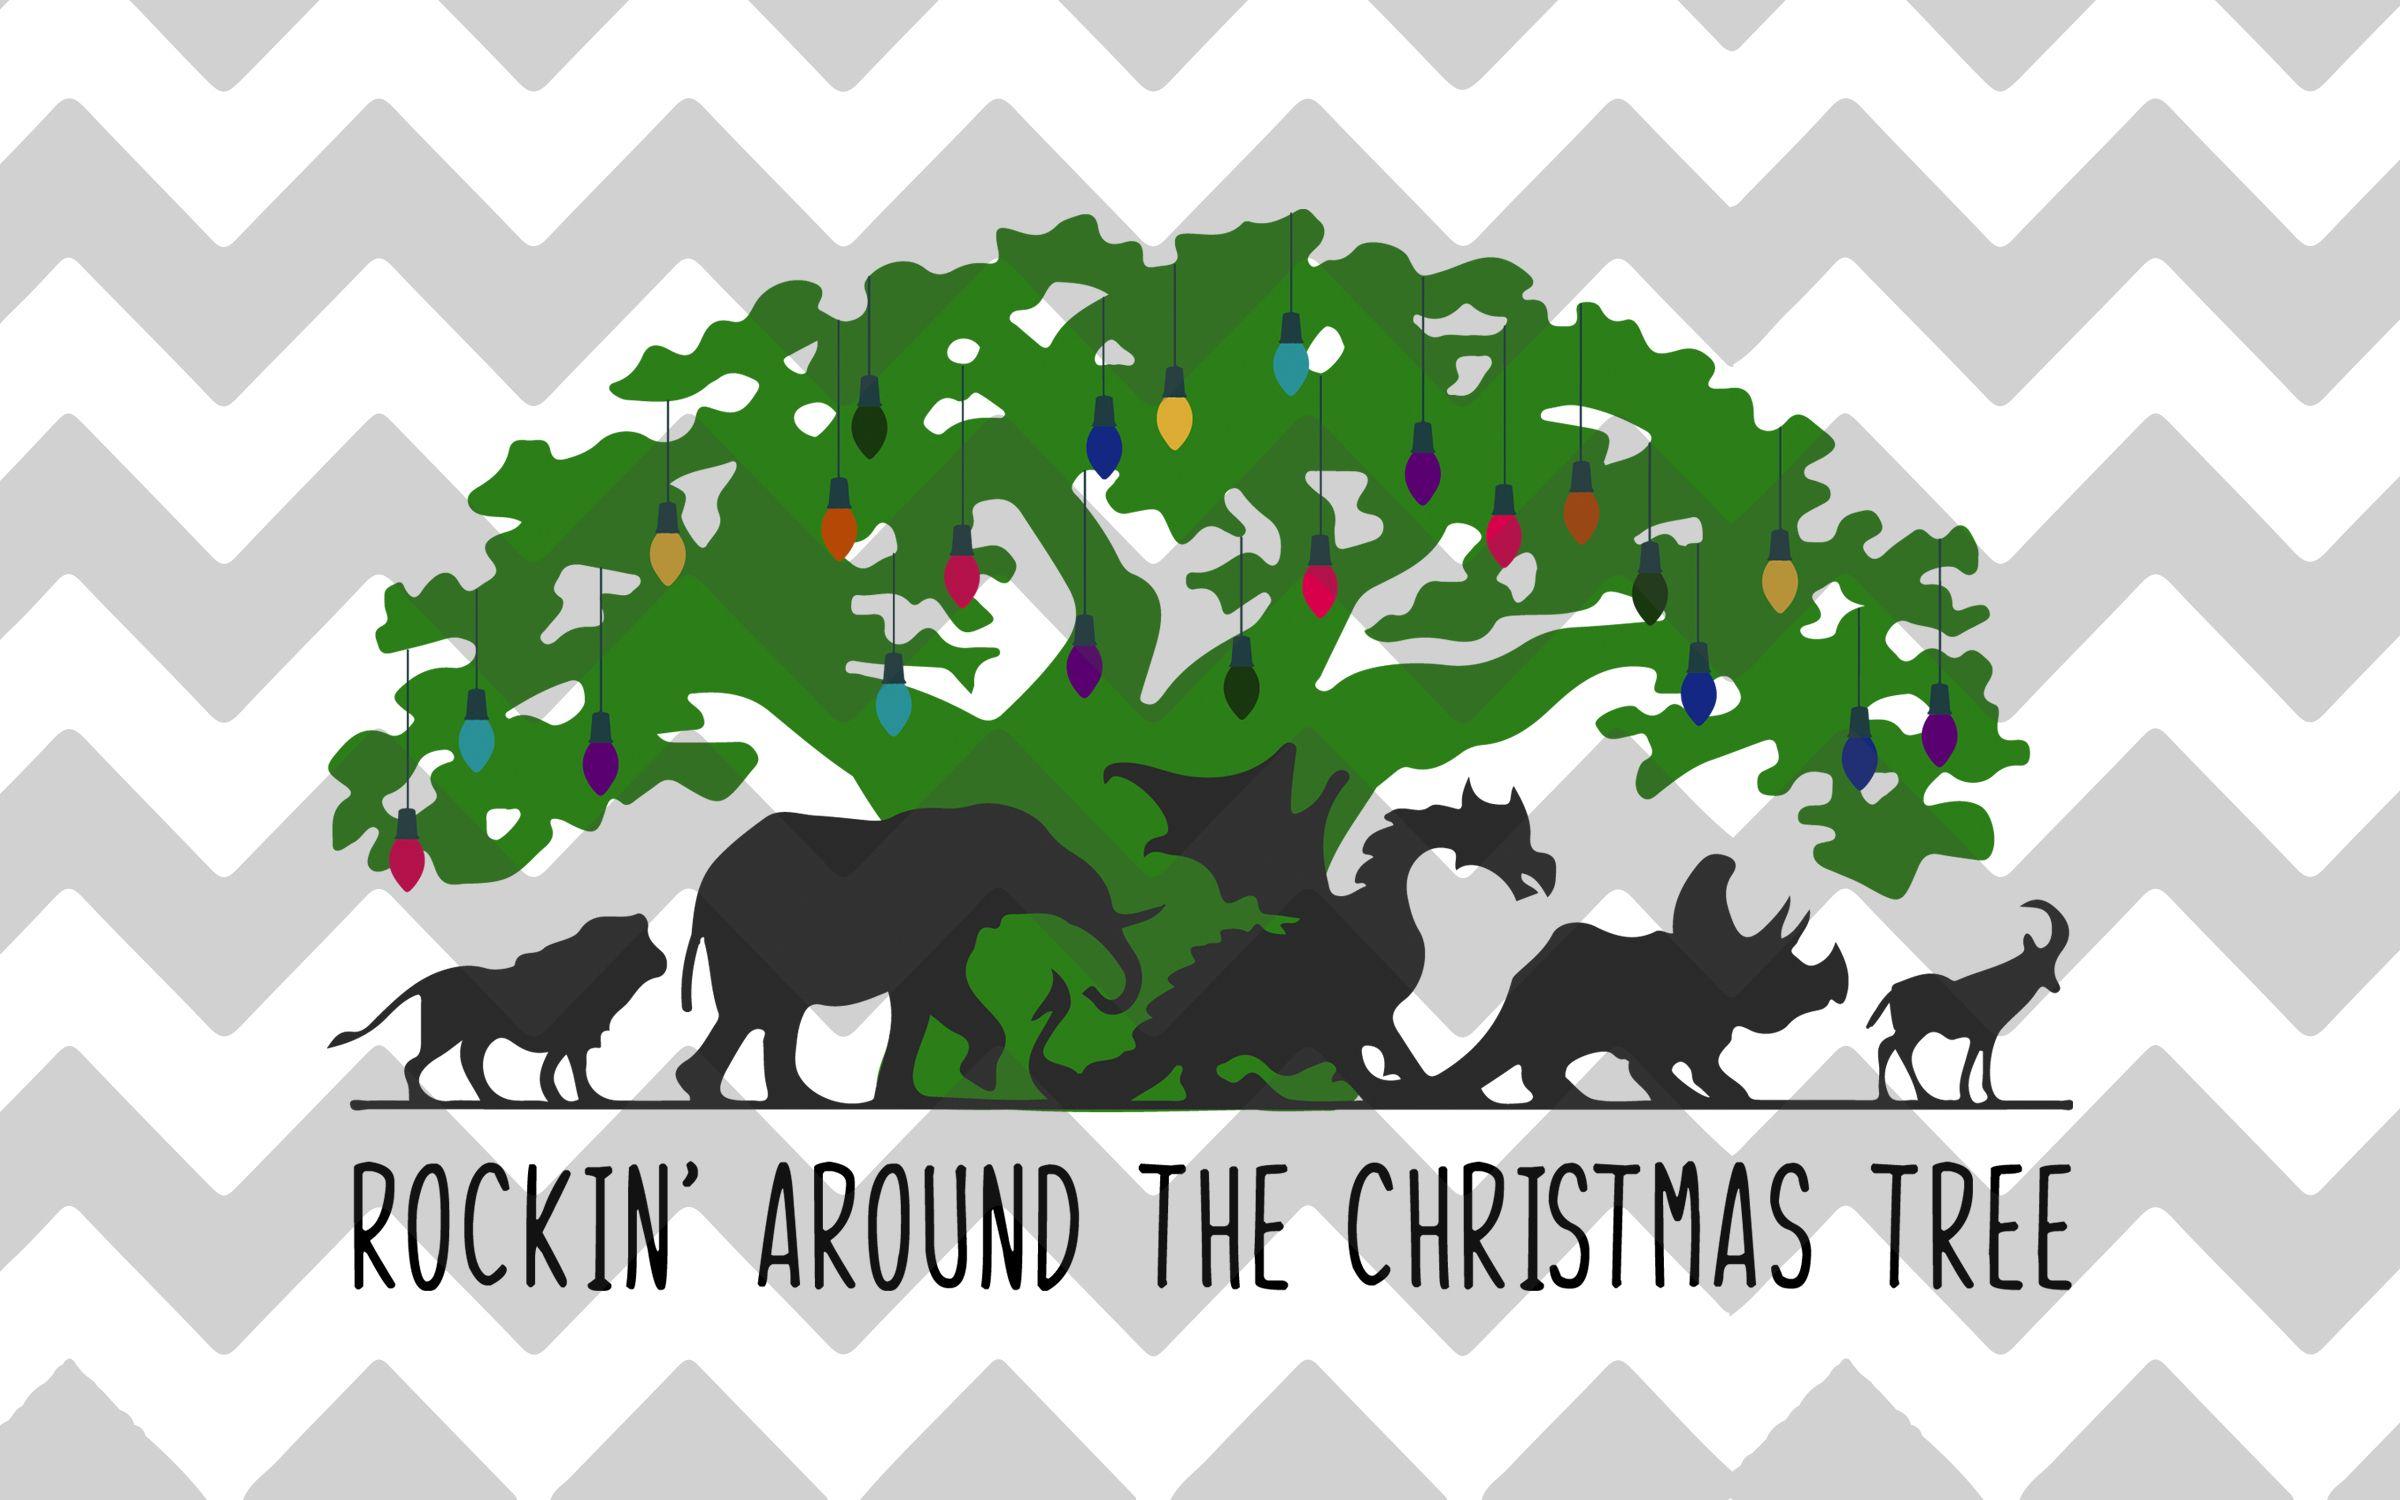 Disney Animal Kingdom Rockin Around The Christmas Tree Svg Dxf Png Animal Kingdom Disney Disney Animals Disney Holiday